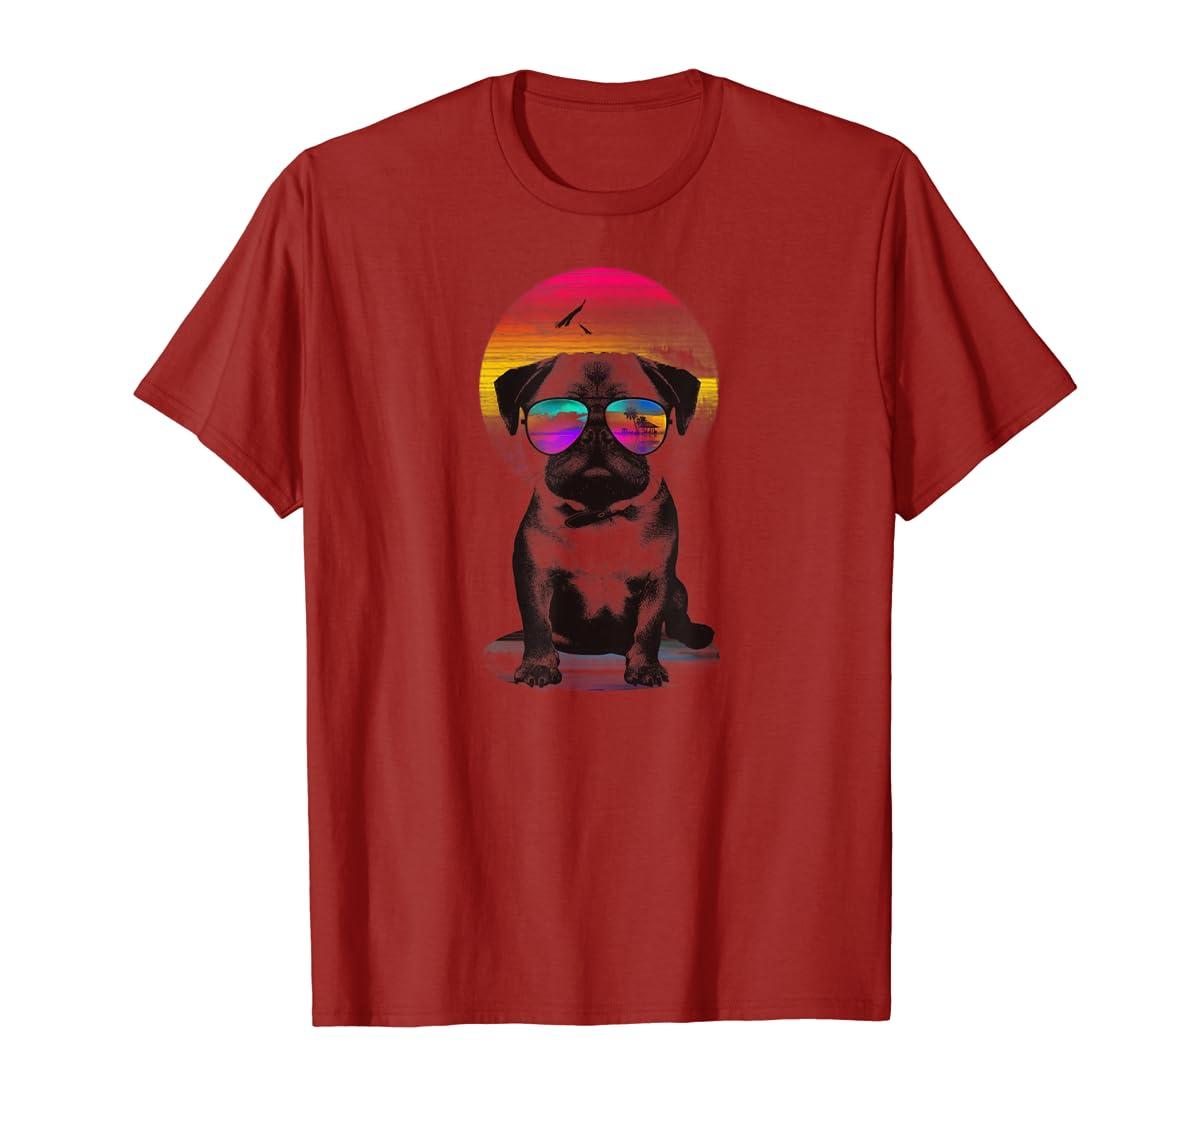 Holiday Sunglasses Pug T-shirt for Women, Men-Men's T-Shirt-Red